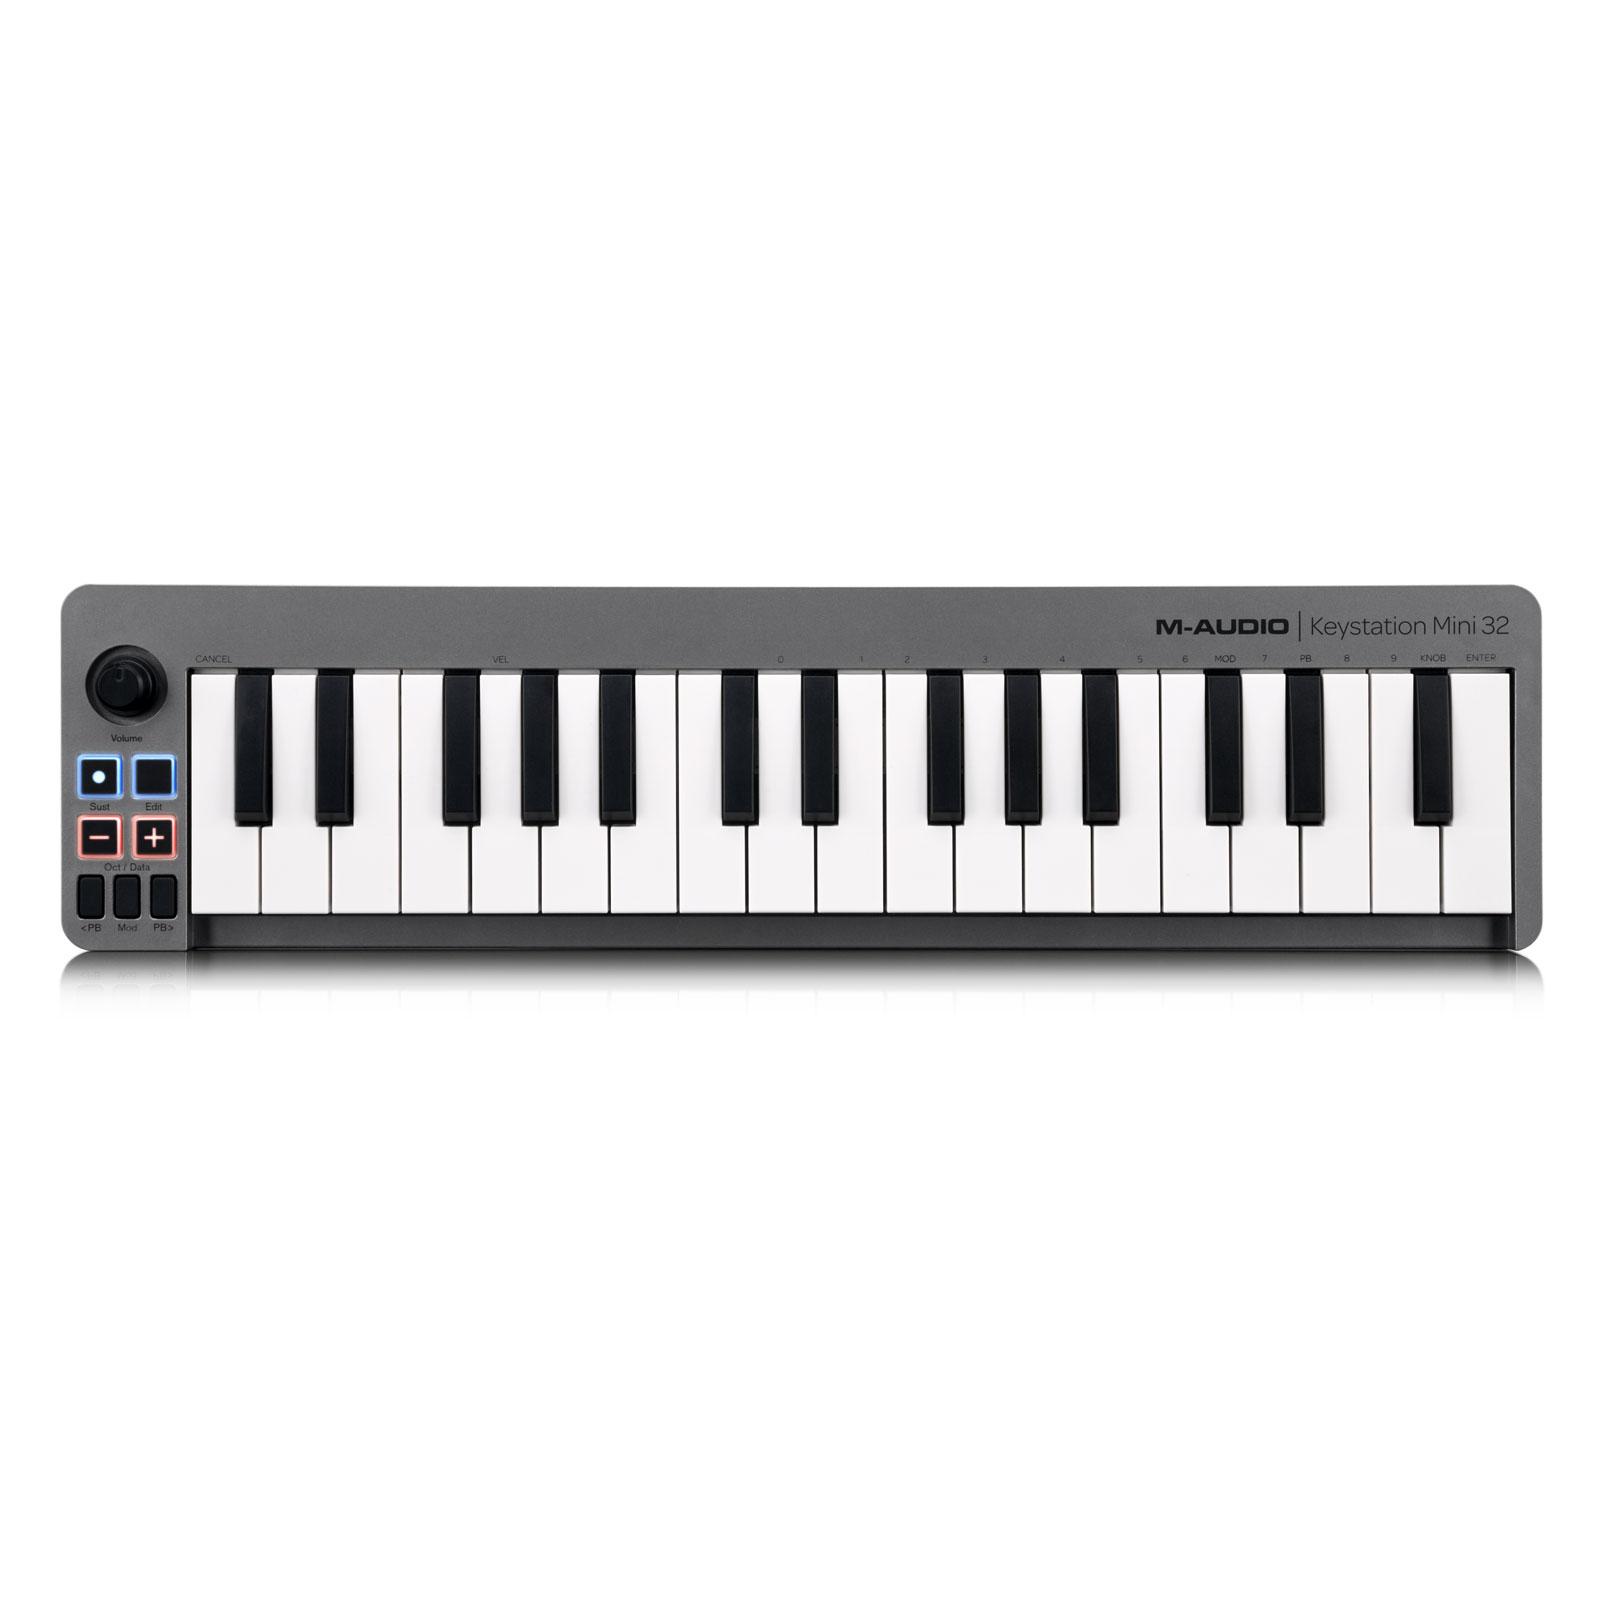 m audio keystation mini 32 clavier home studio m audio. Black Bedroom Furniture Sets. Home Design Ideas